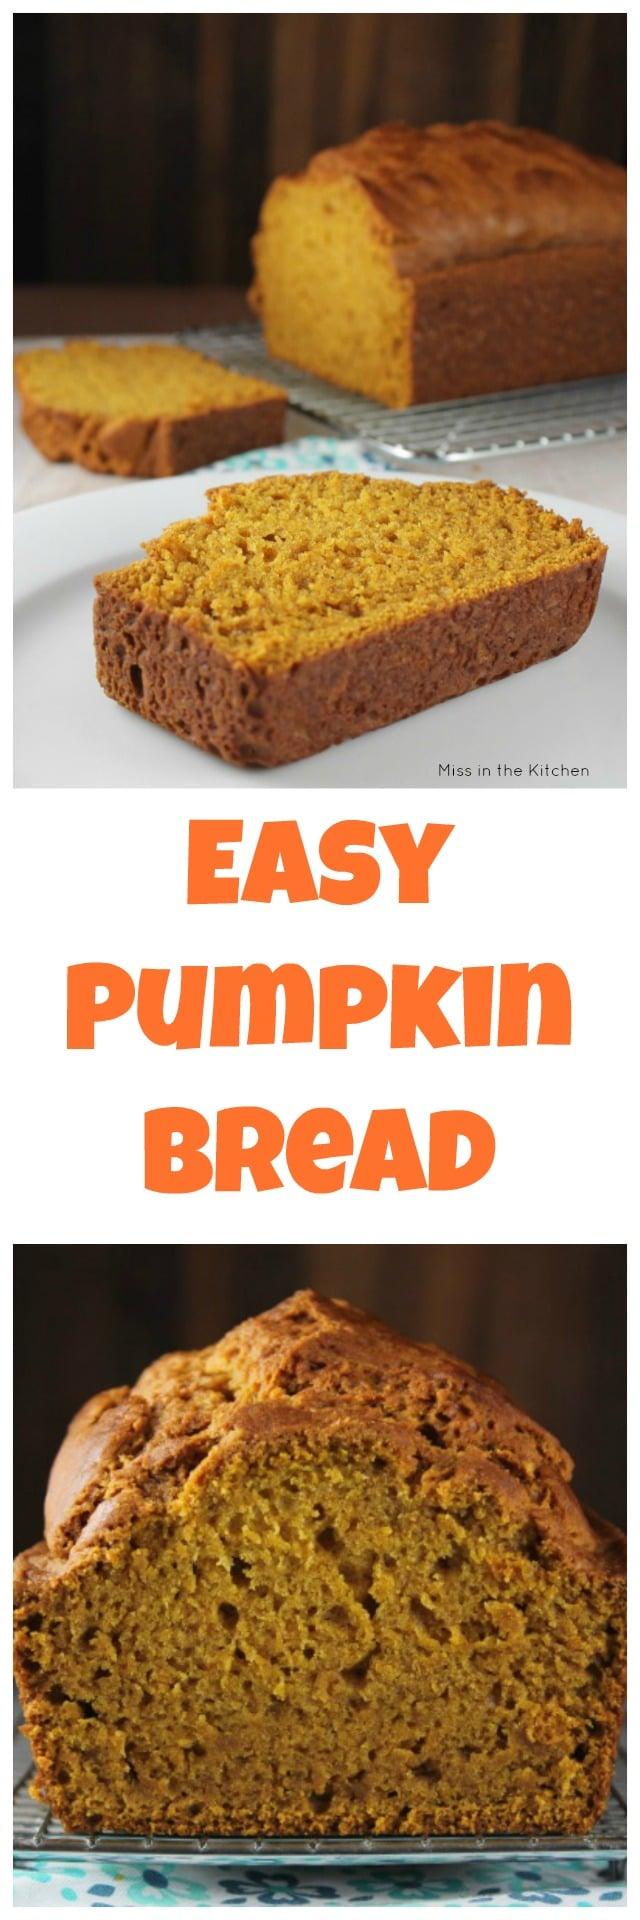 Easy Pumpkin Bread Recipe One Bowl No Mixer Required